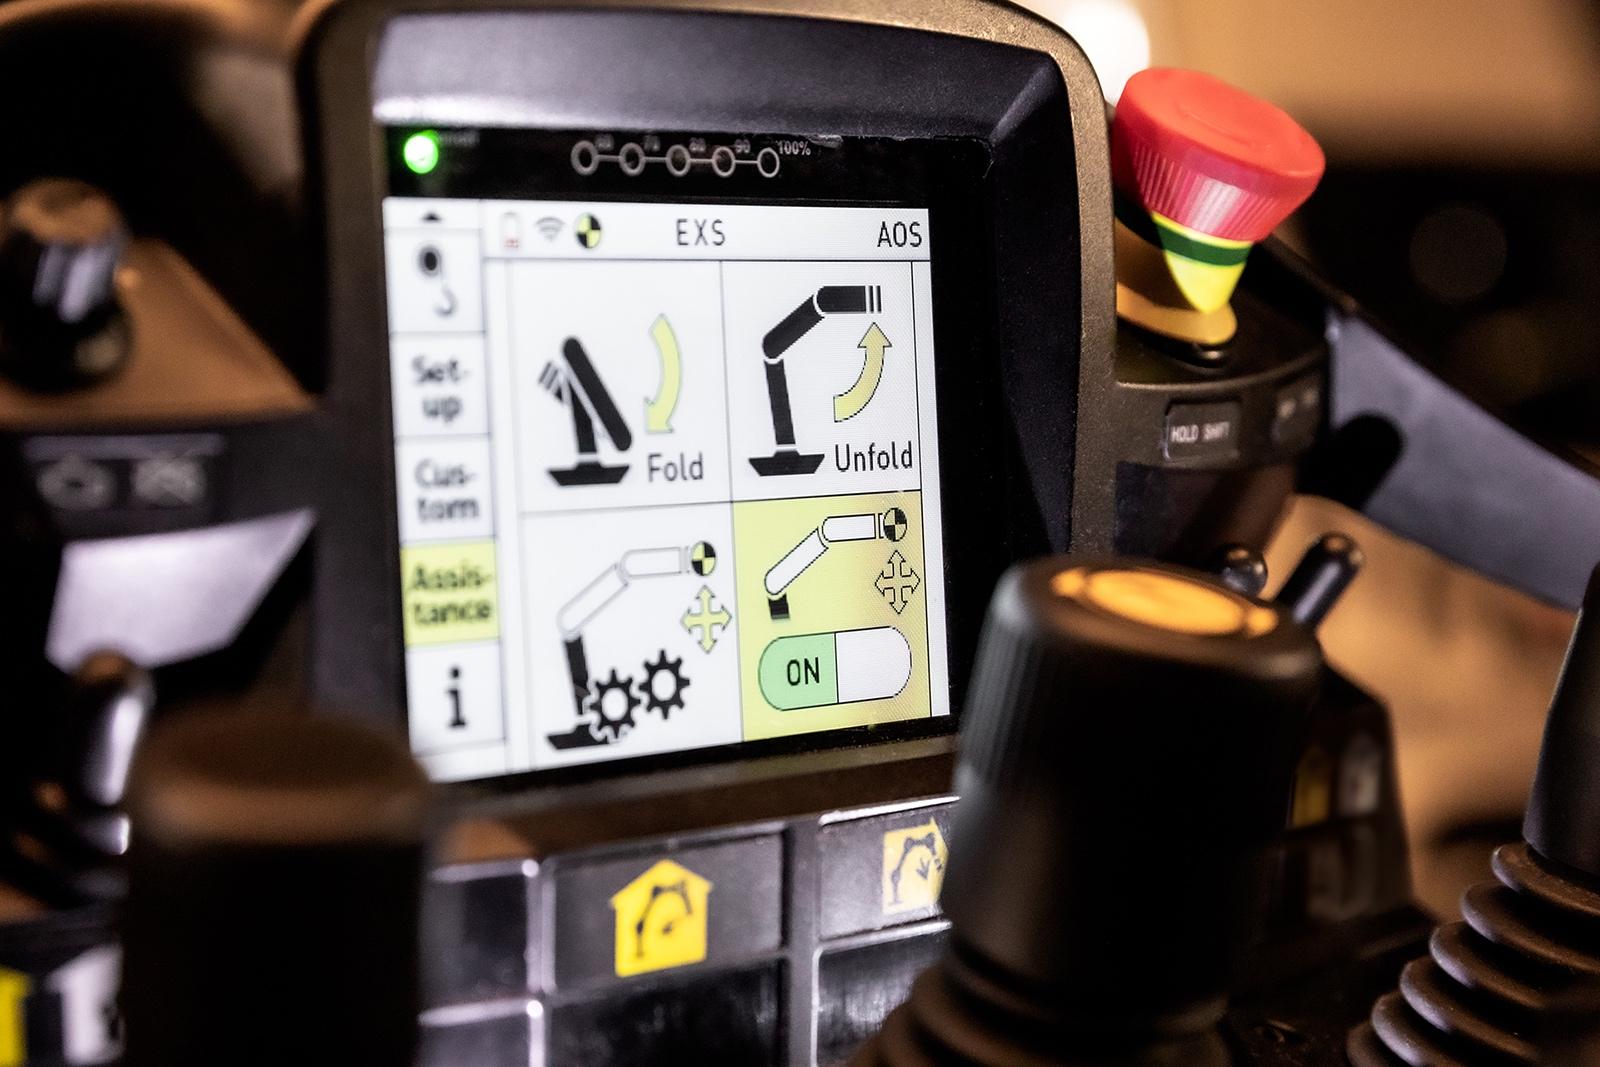 PALFINGER Smart Control2